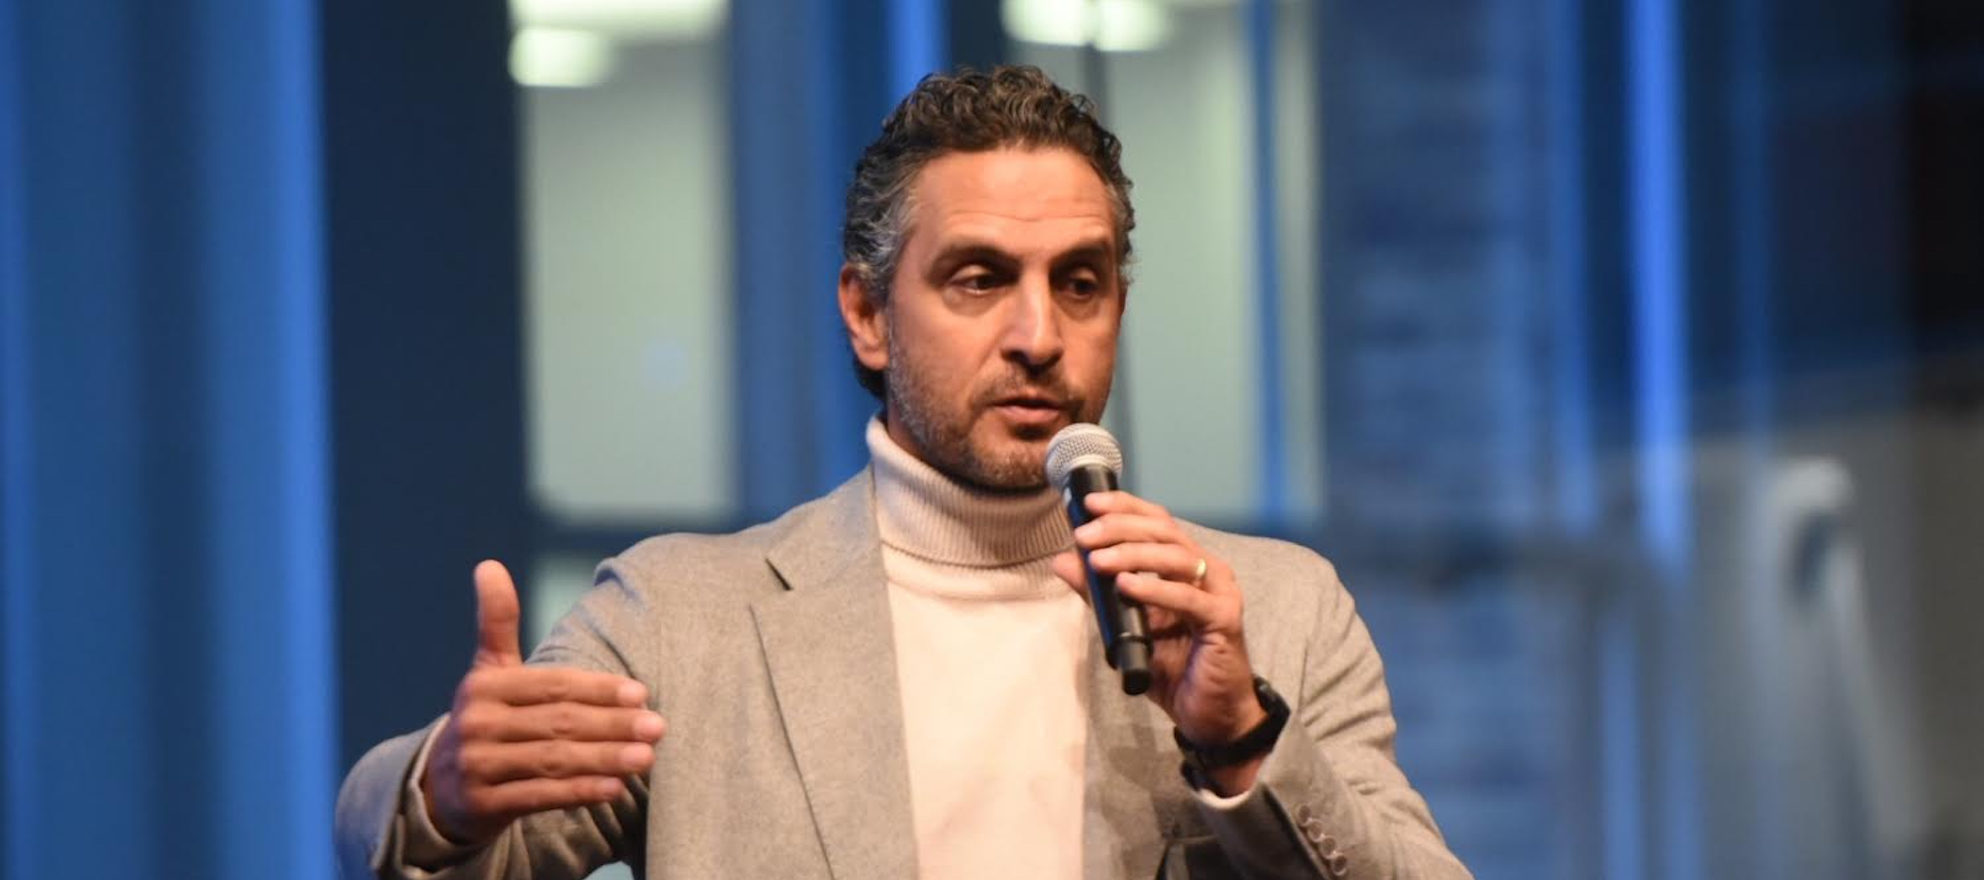 The Agency CEO dismisses Purplebricks agents as 'plumbers'